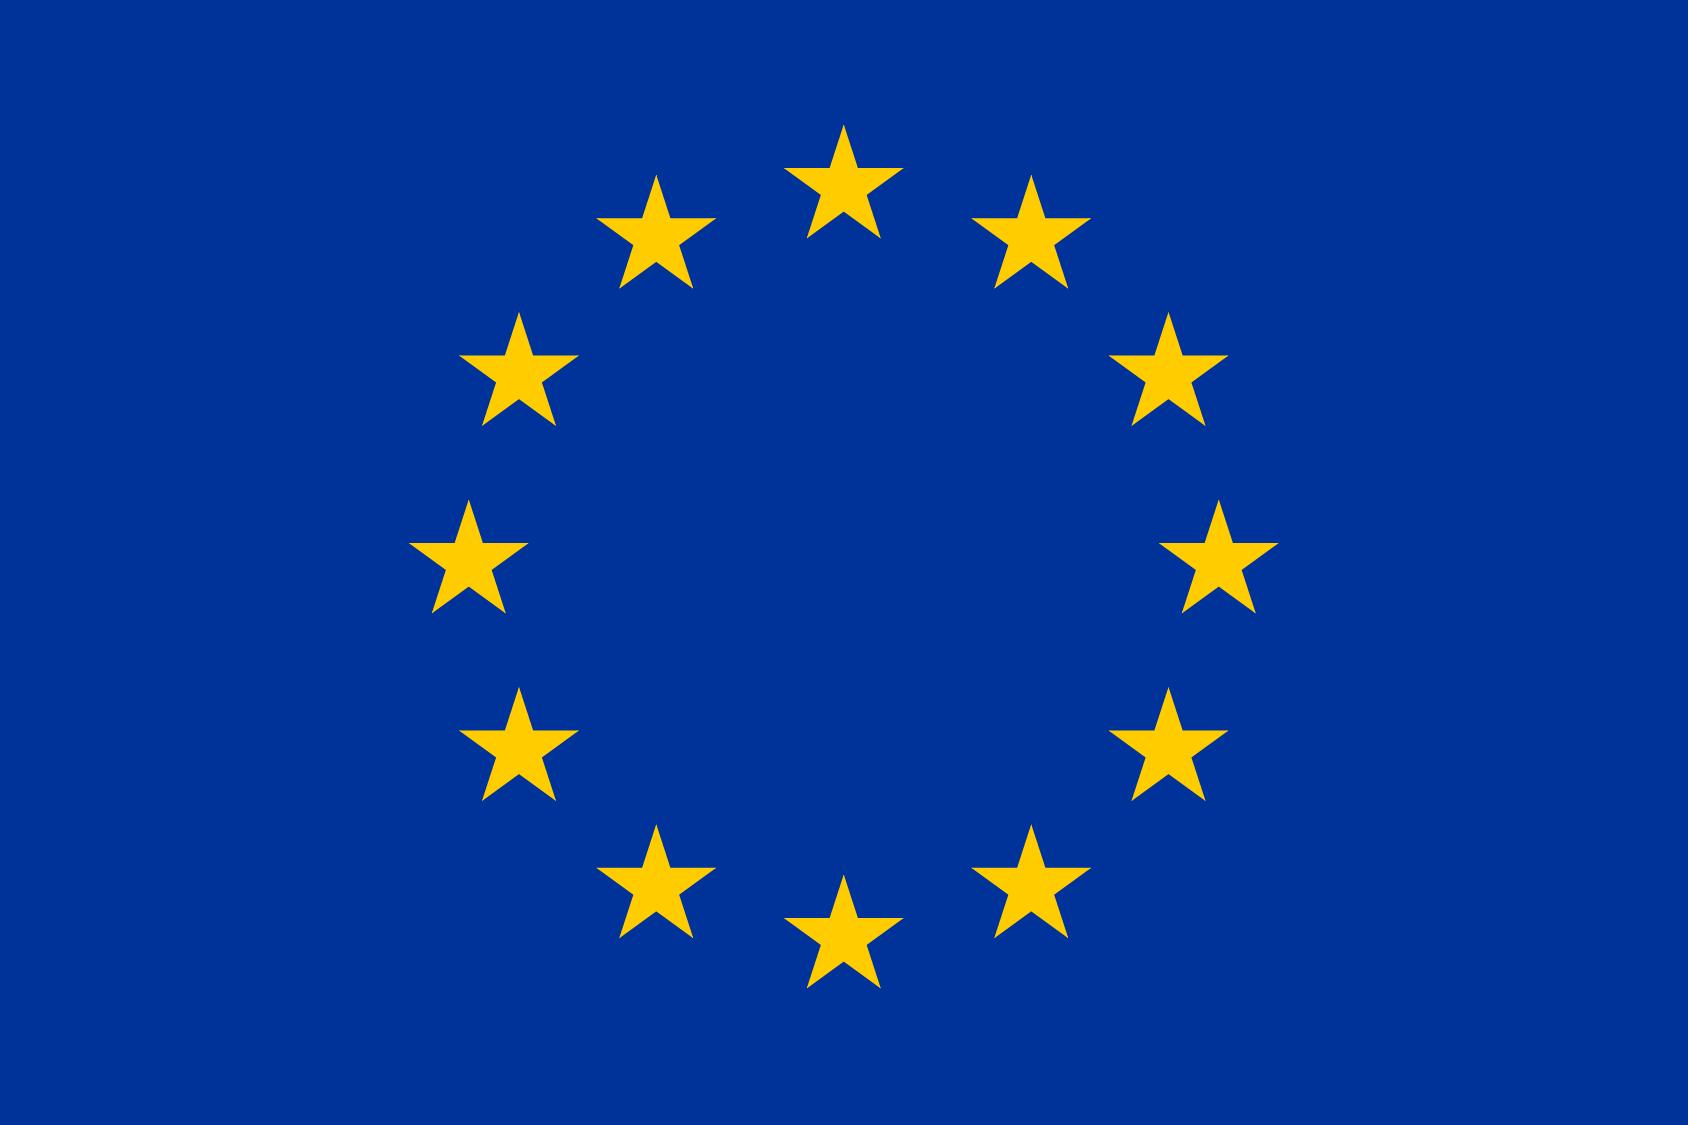 Europa Union